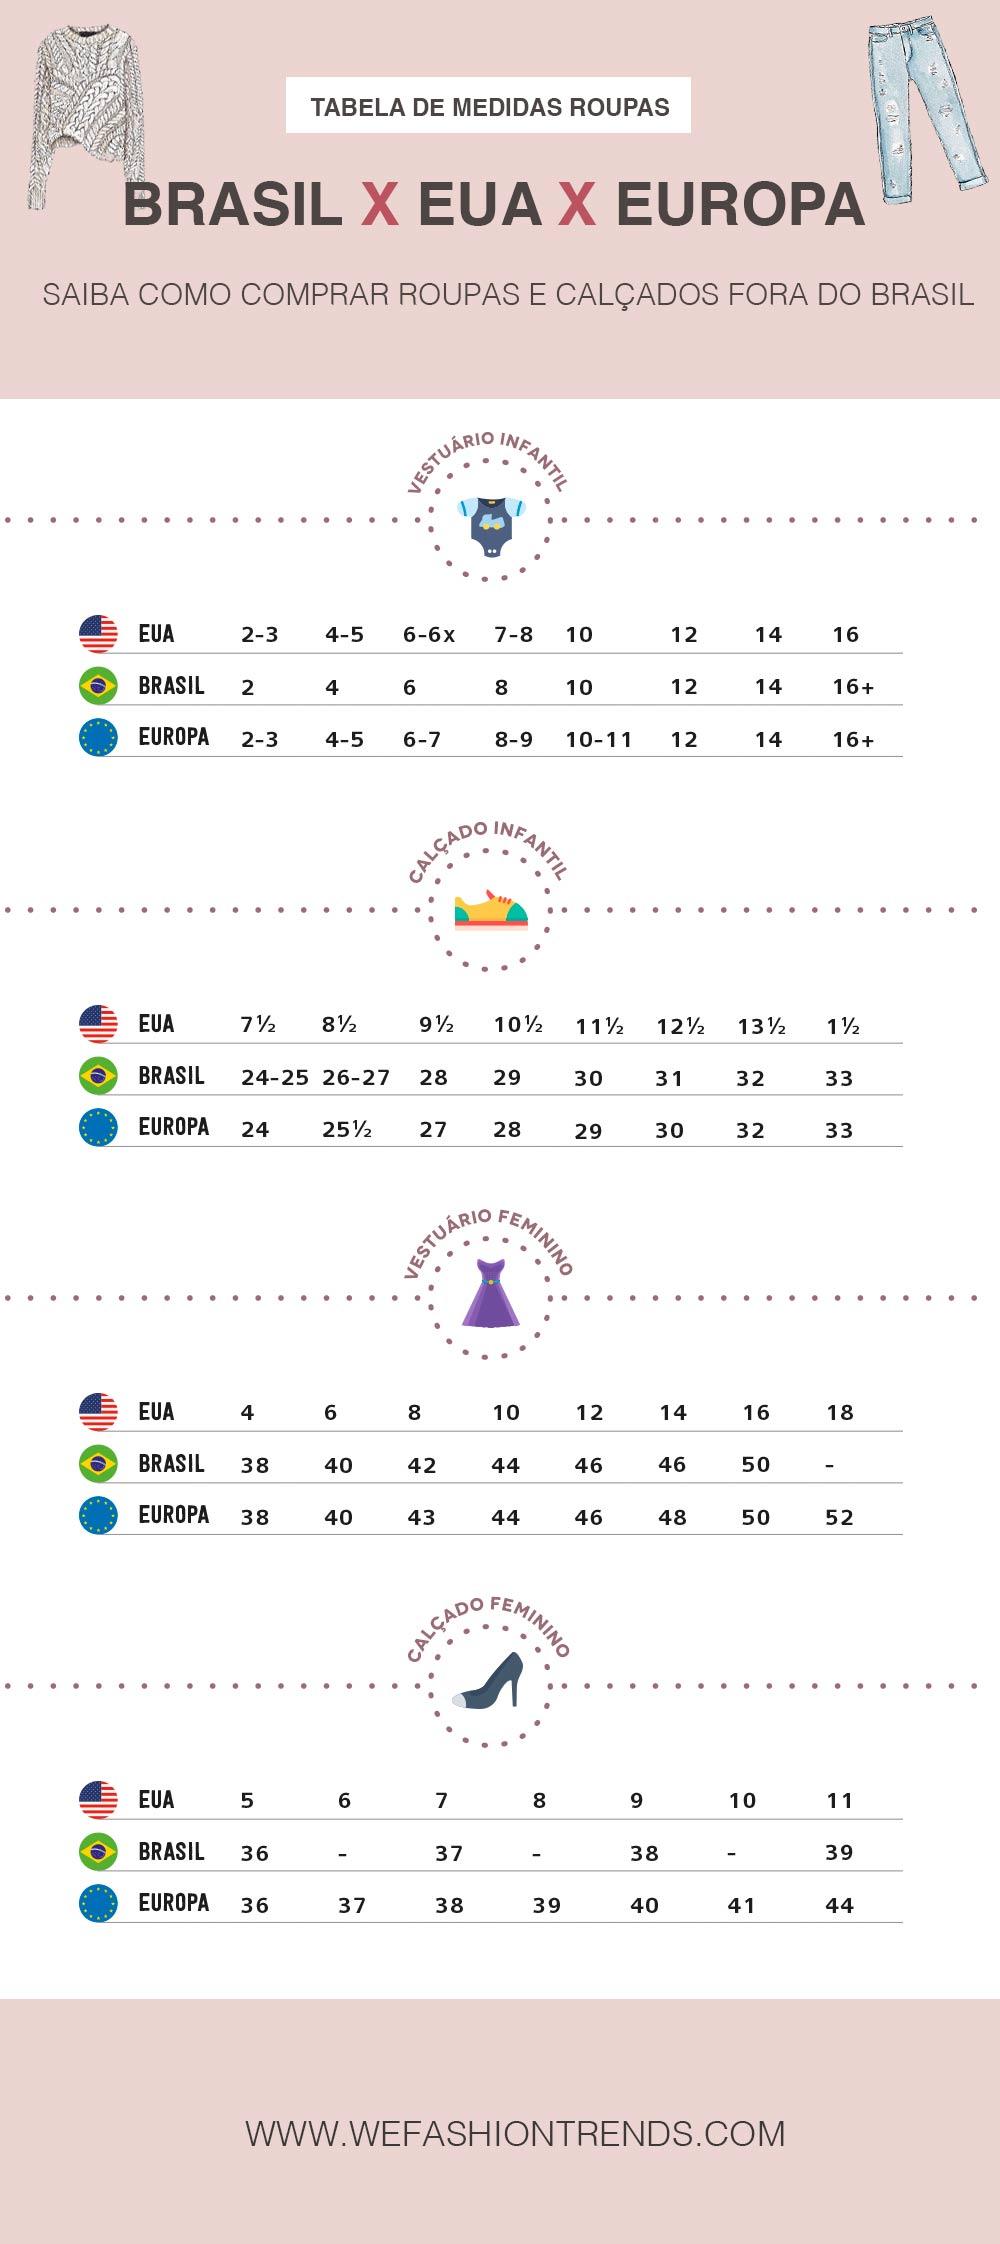 tabela-de-medidas-de-roupas-e-calçados-brasil-europa-e-estados-unidos